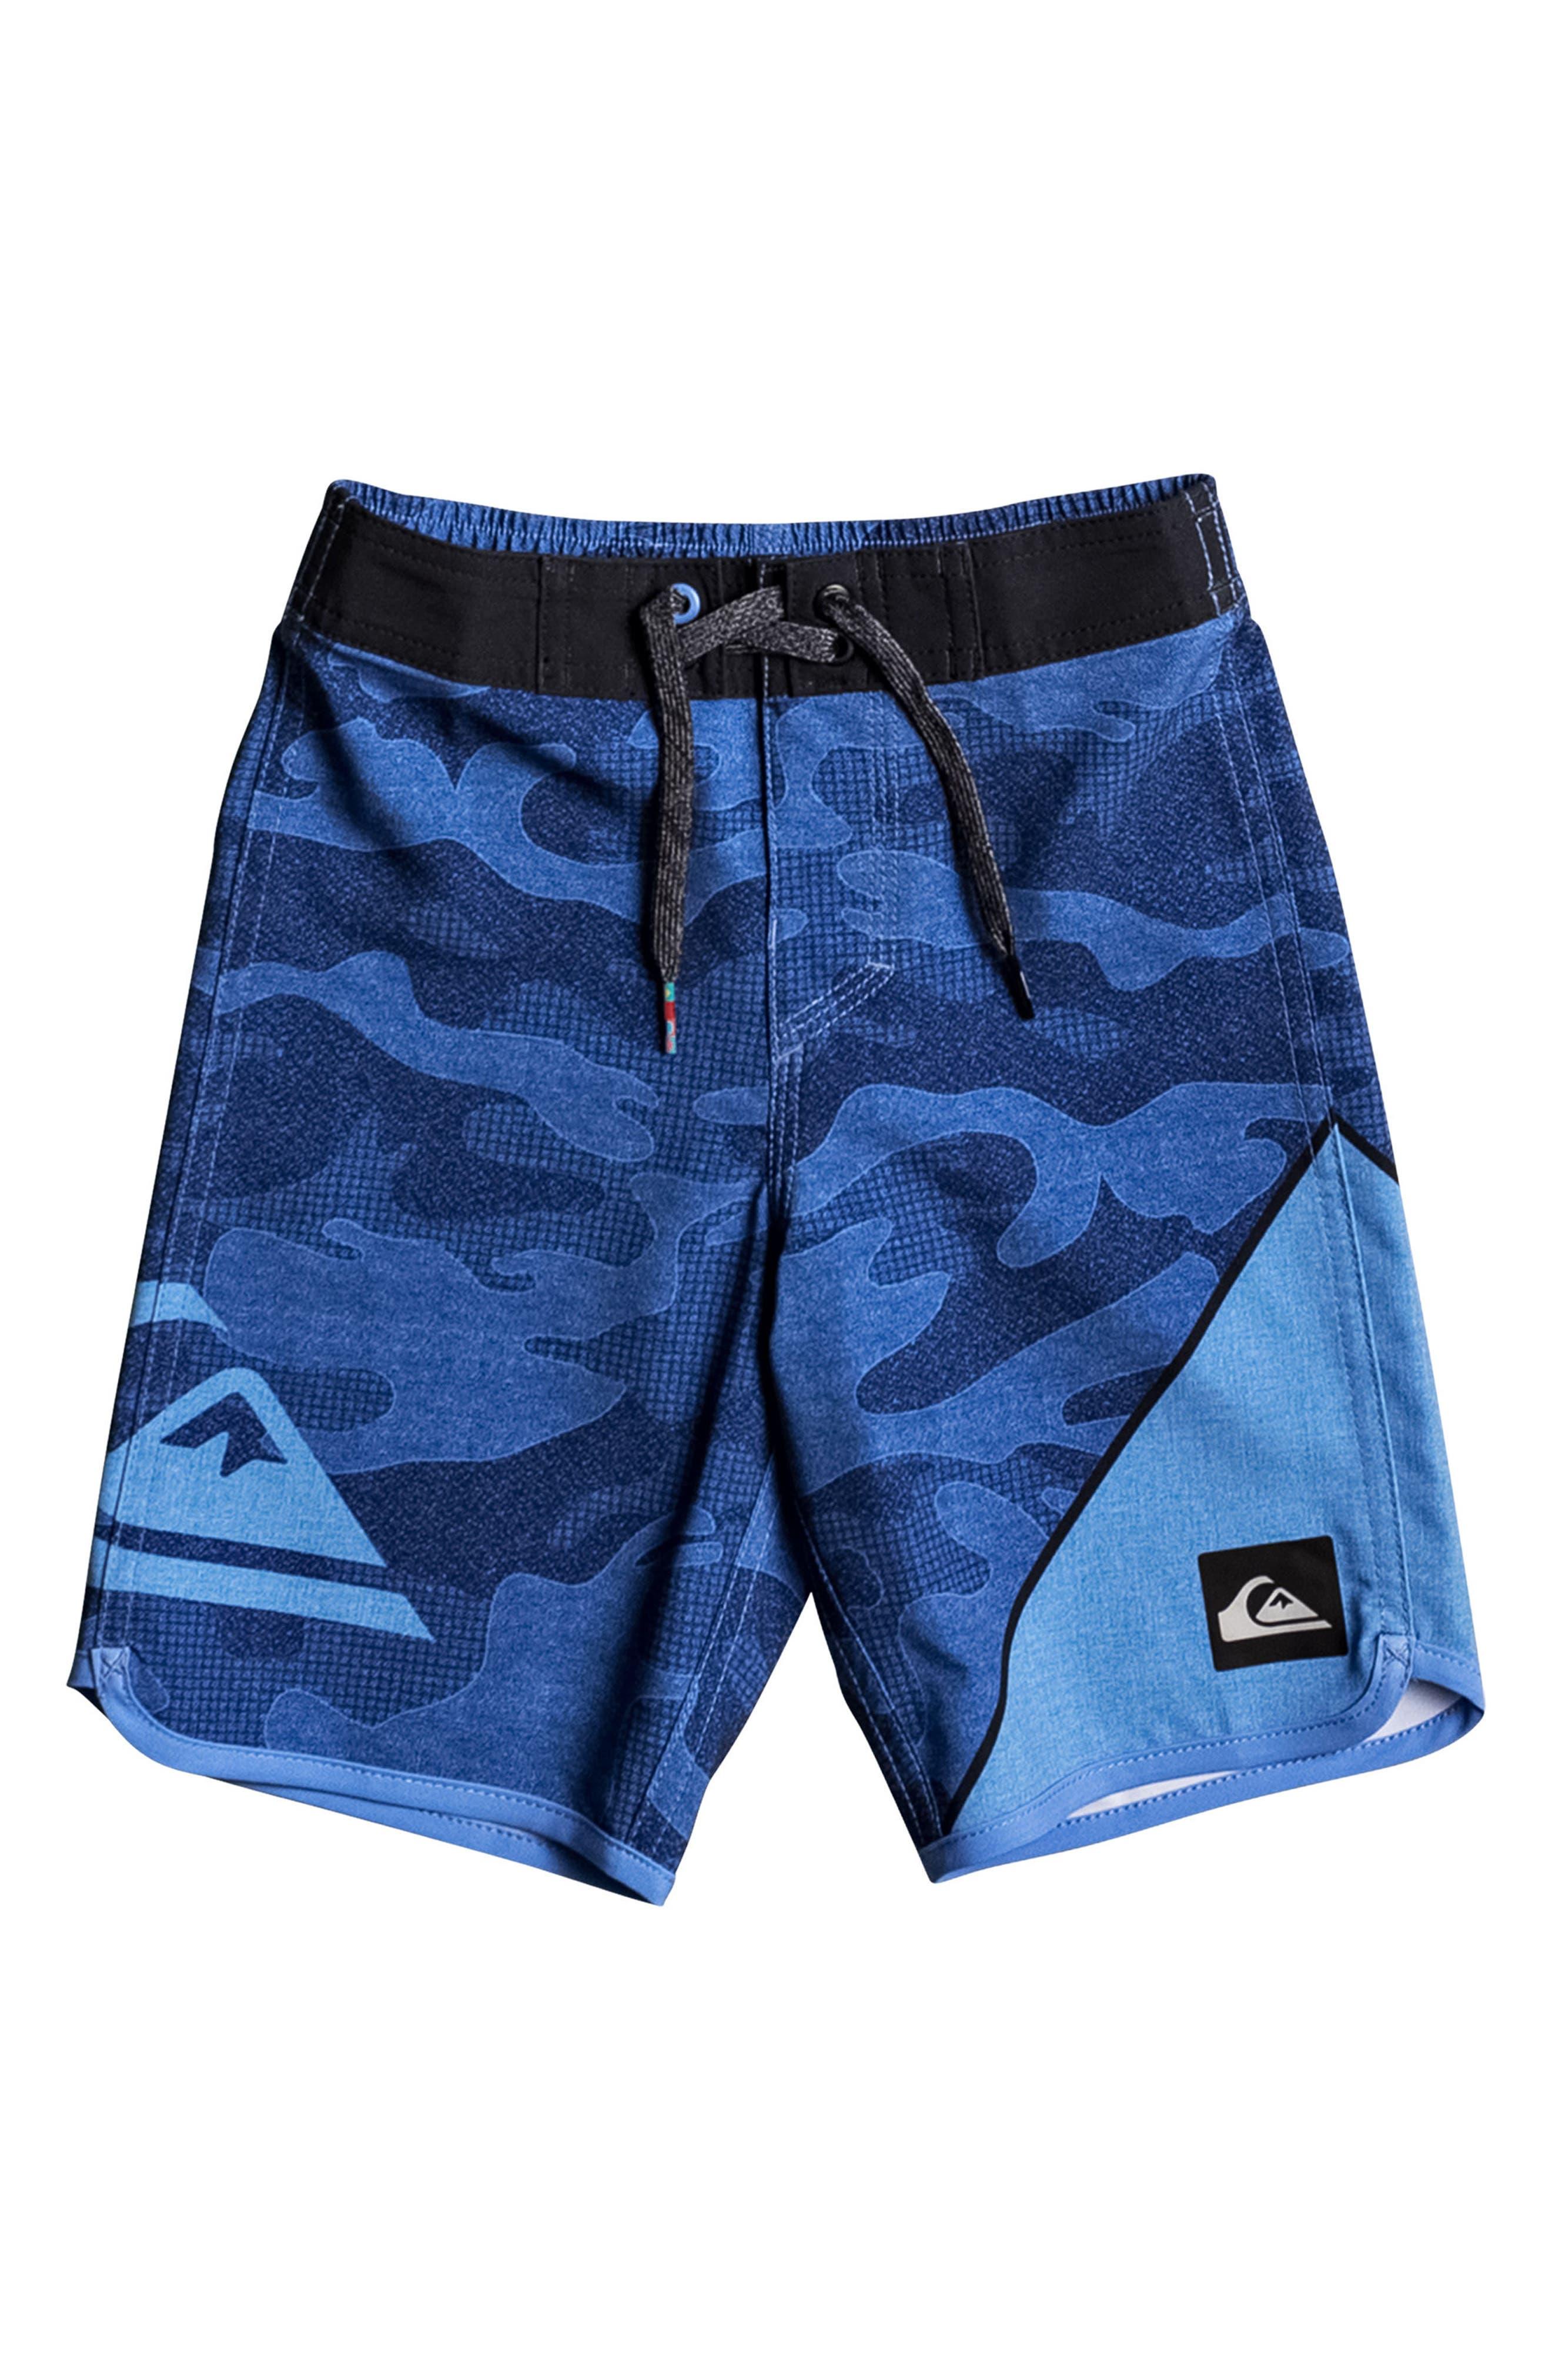 New Wave Everyday Board Shorts,                         Main,                         color, Regatta